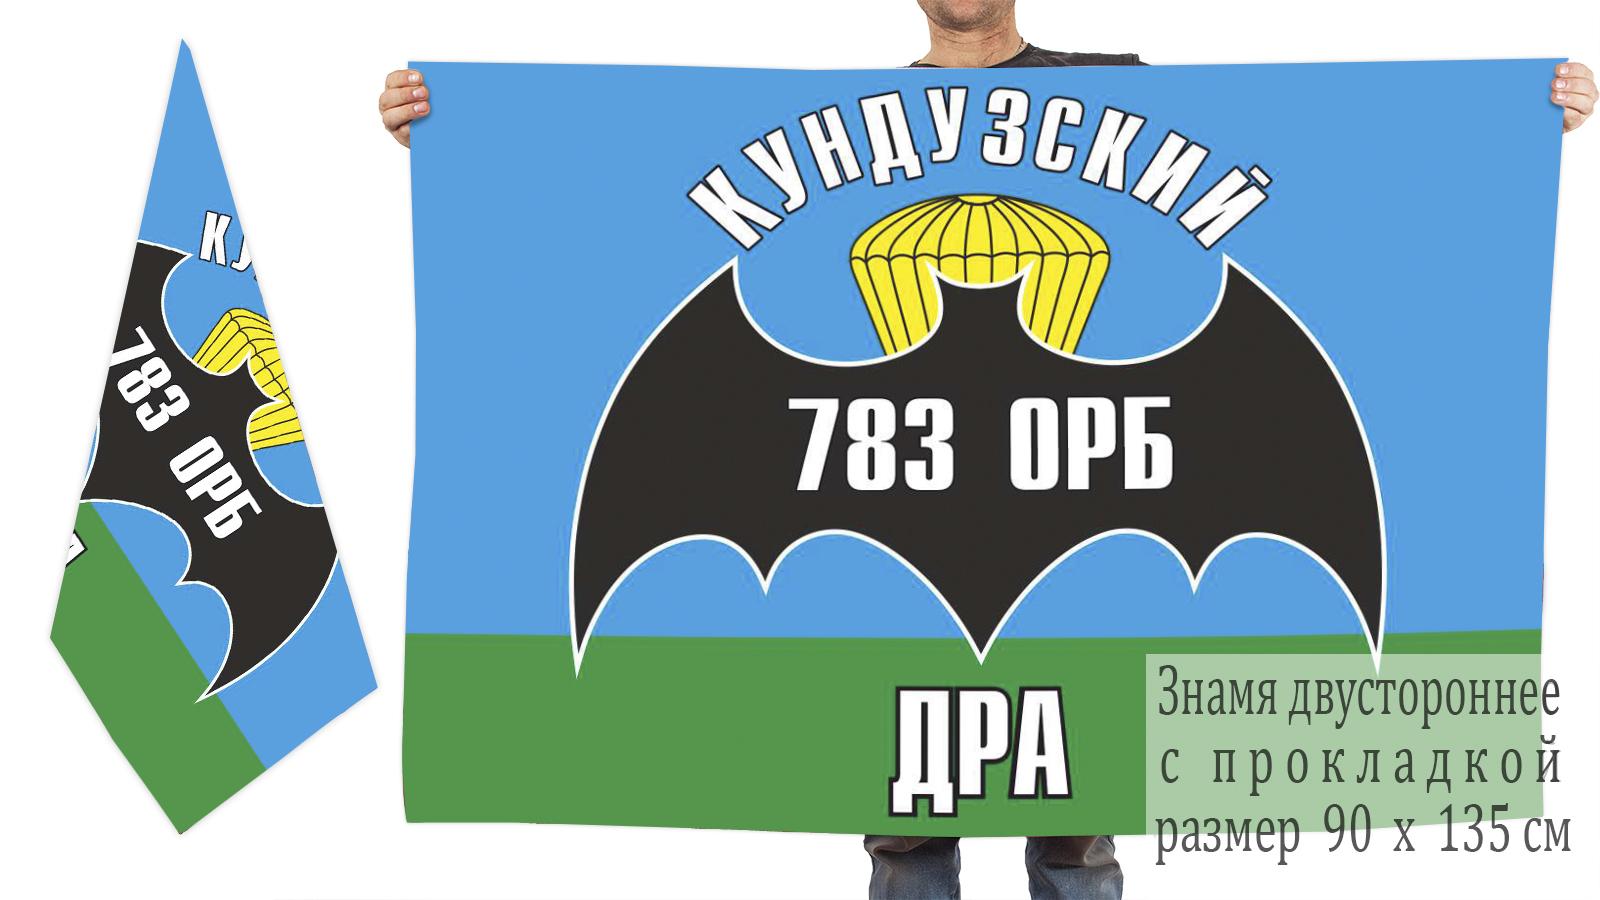 "Двусторонний флаг 783 ОРБ ""Кундузский"" ДРА"